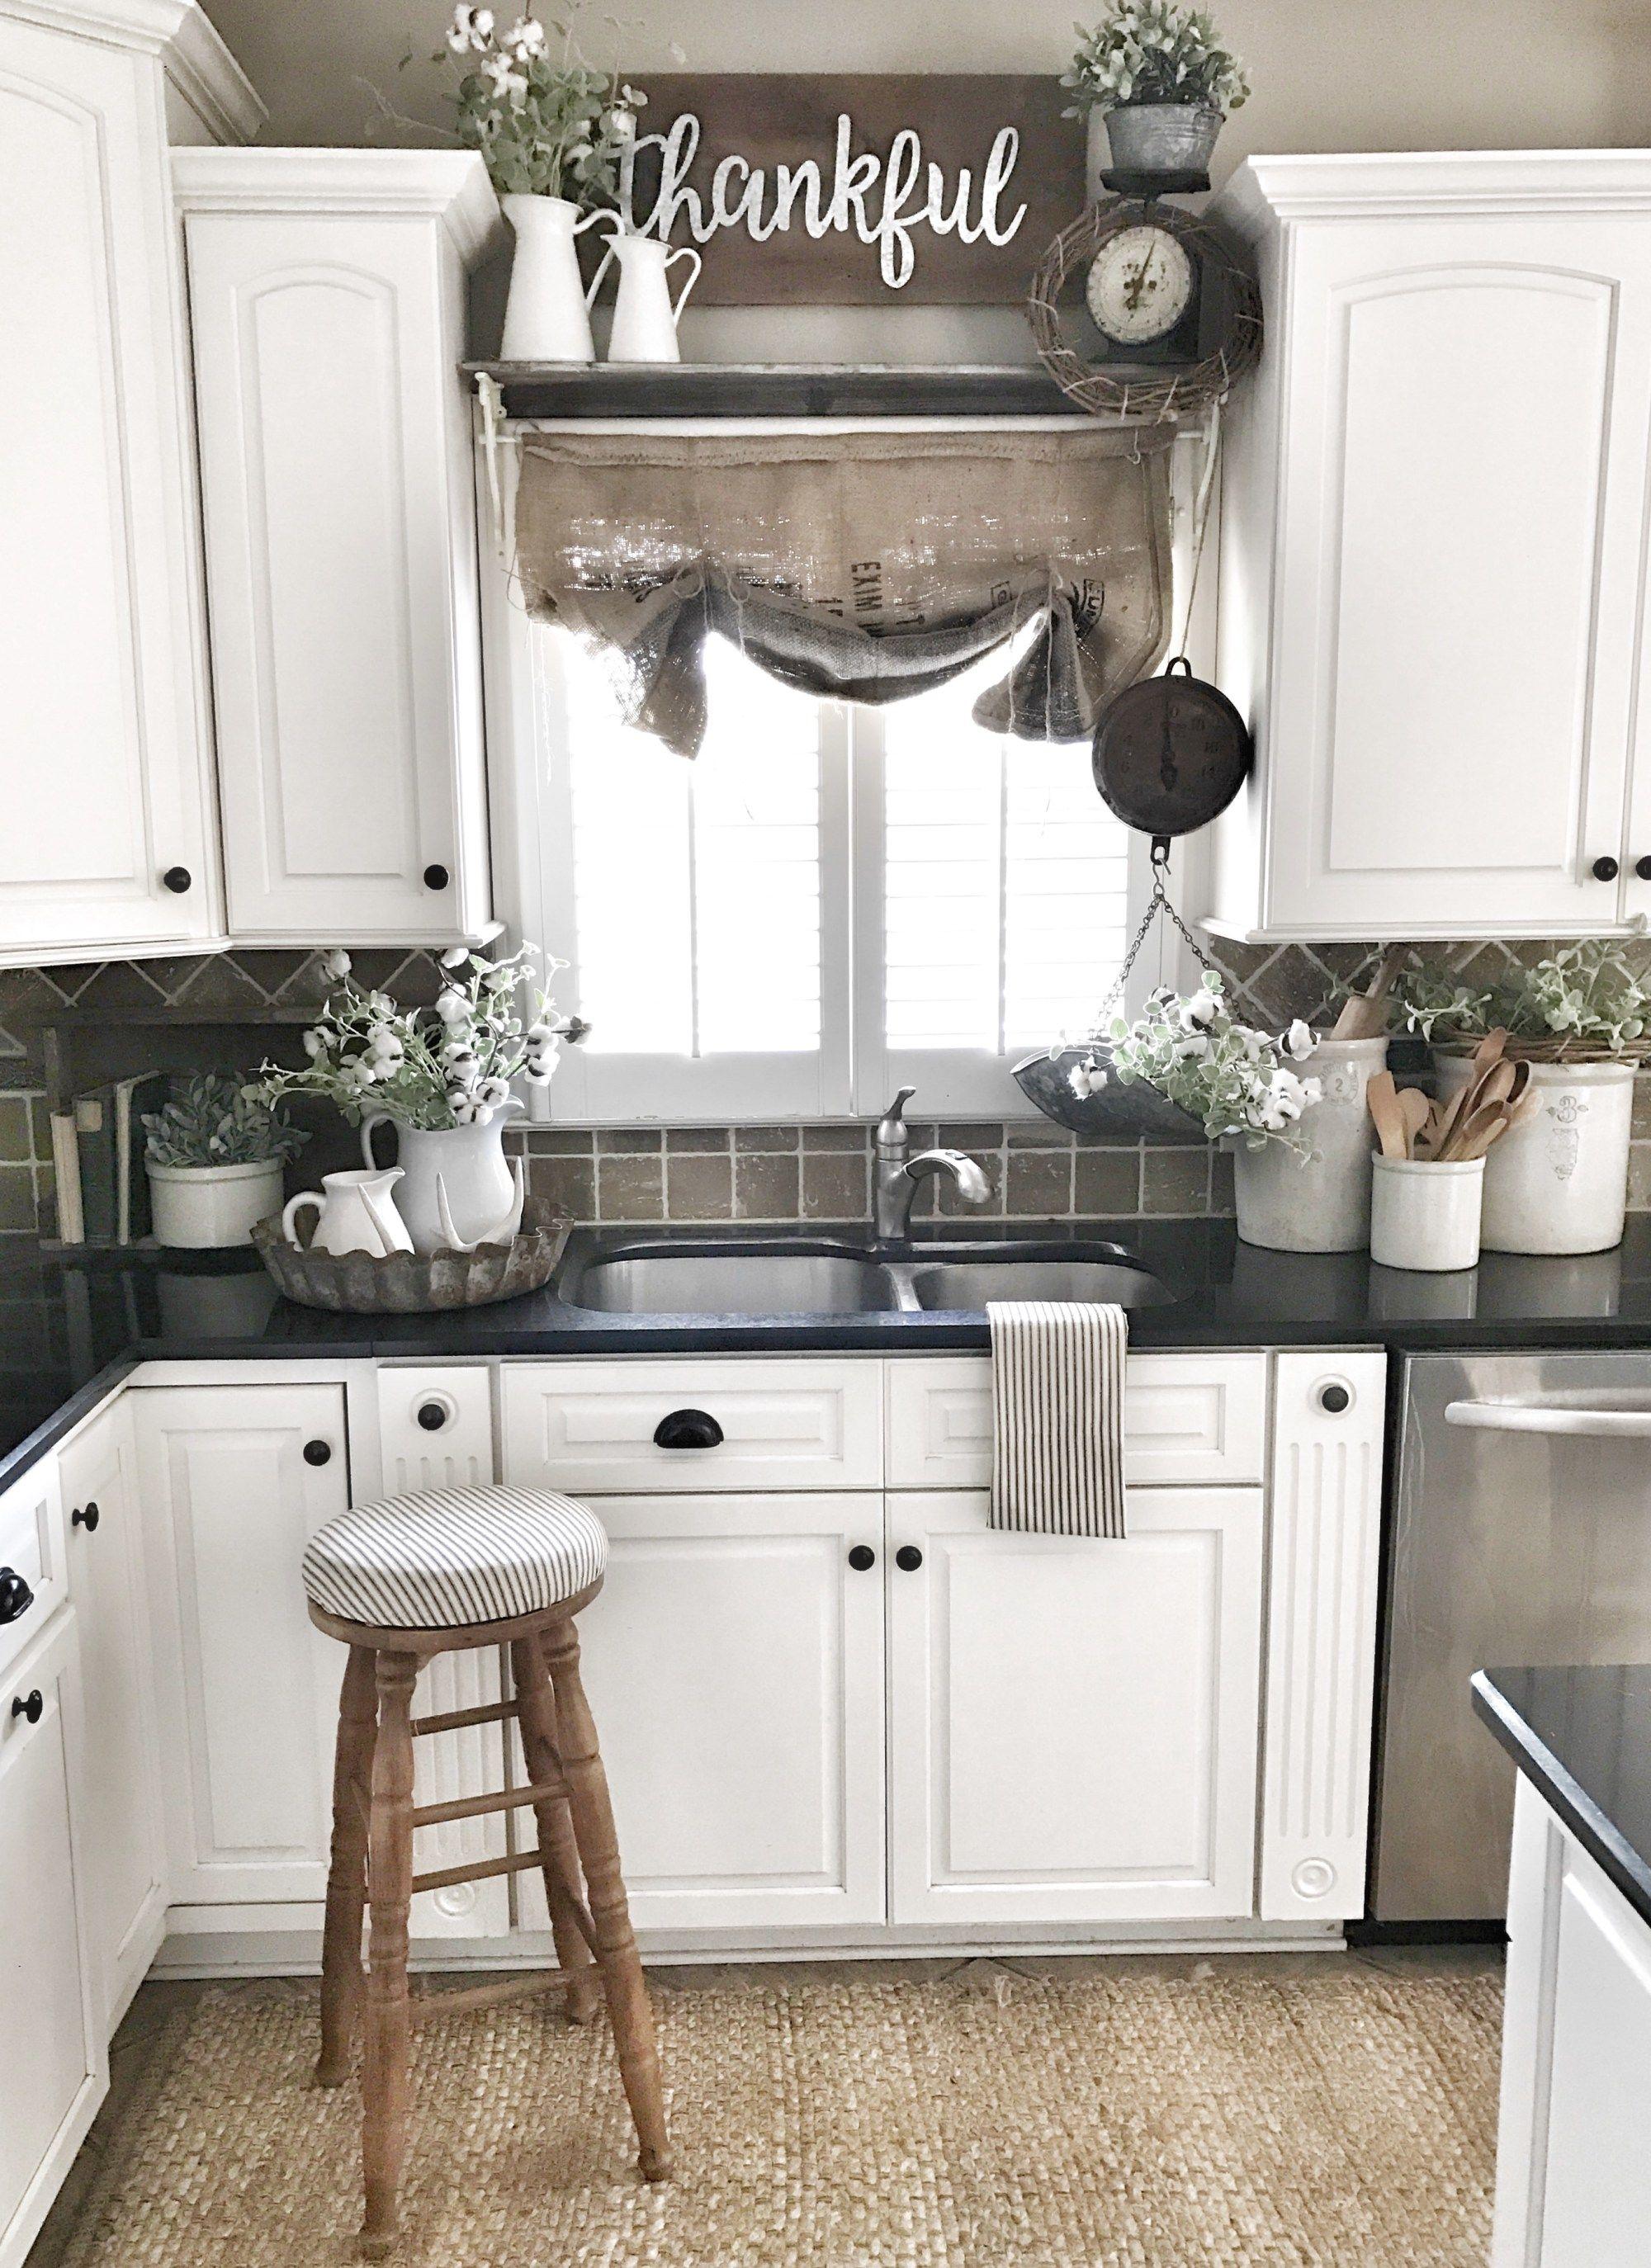 My Kitchen Makeover- Adding Farmhouse To Your Kitchen #kitchenmakeovers